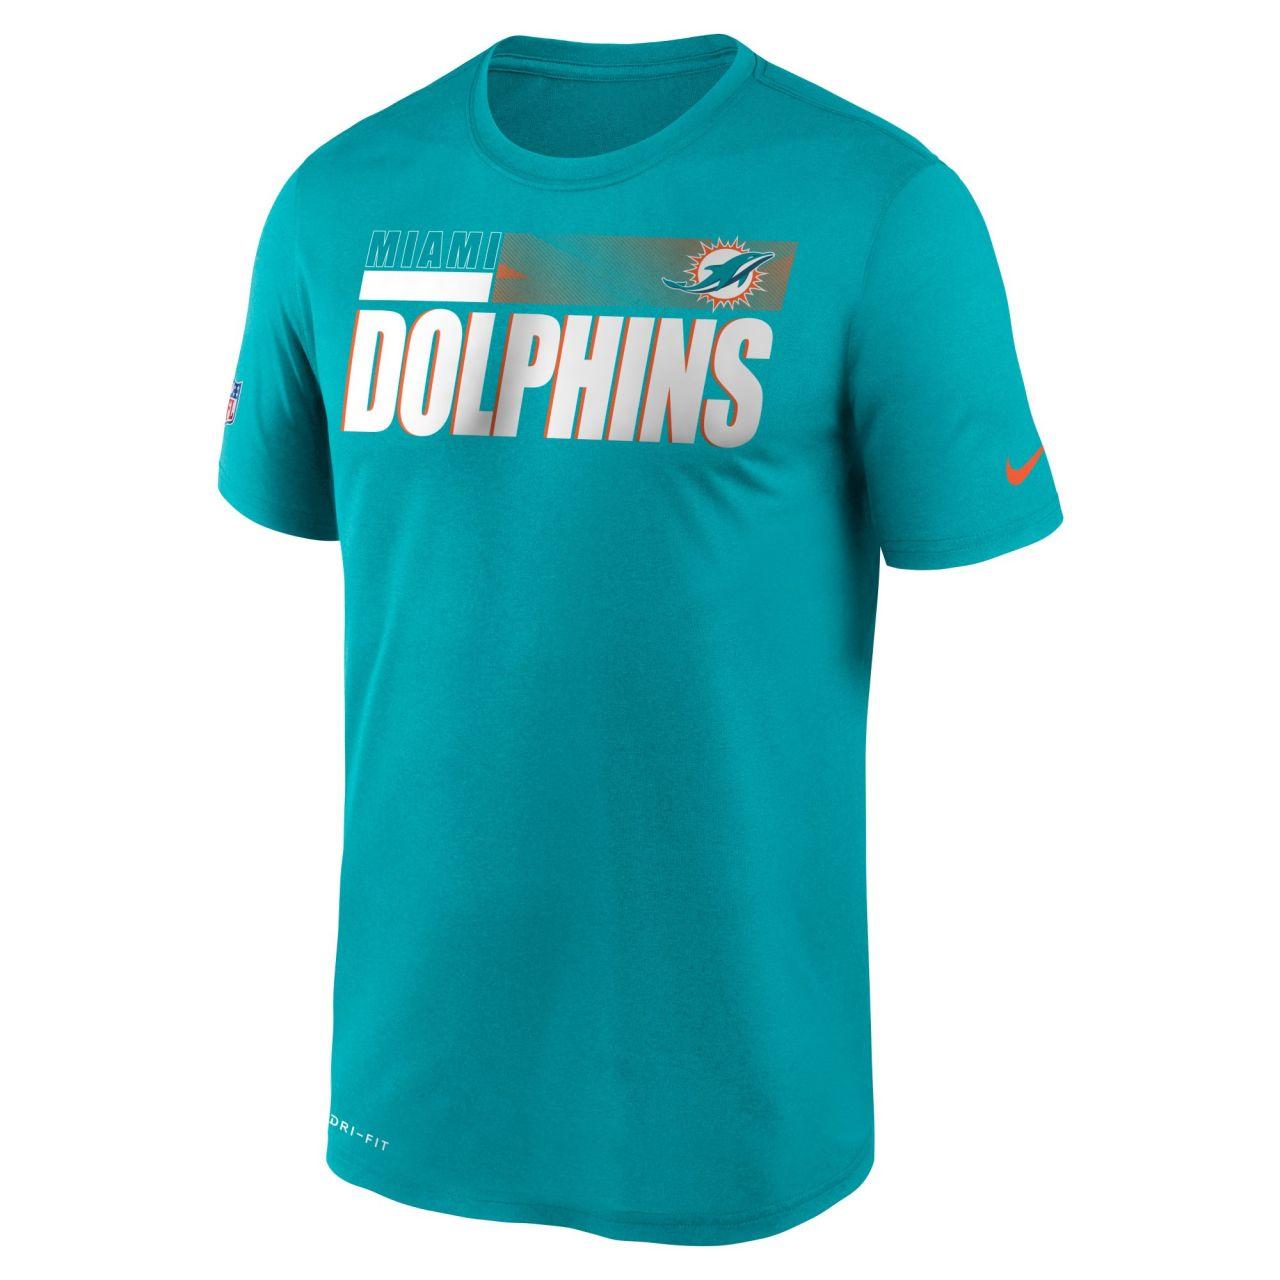 amfoo - Nike Dri-FIT Legend Shirt - SIDELINE Miami Dolphins